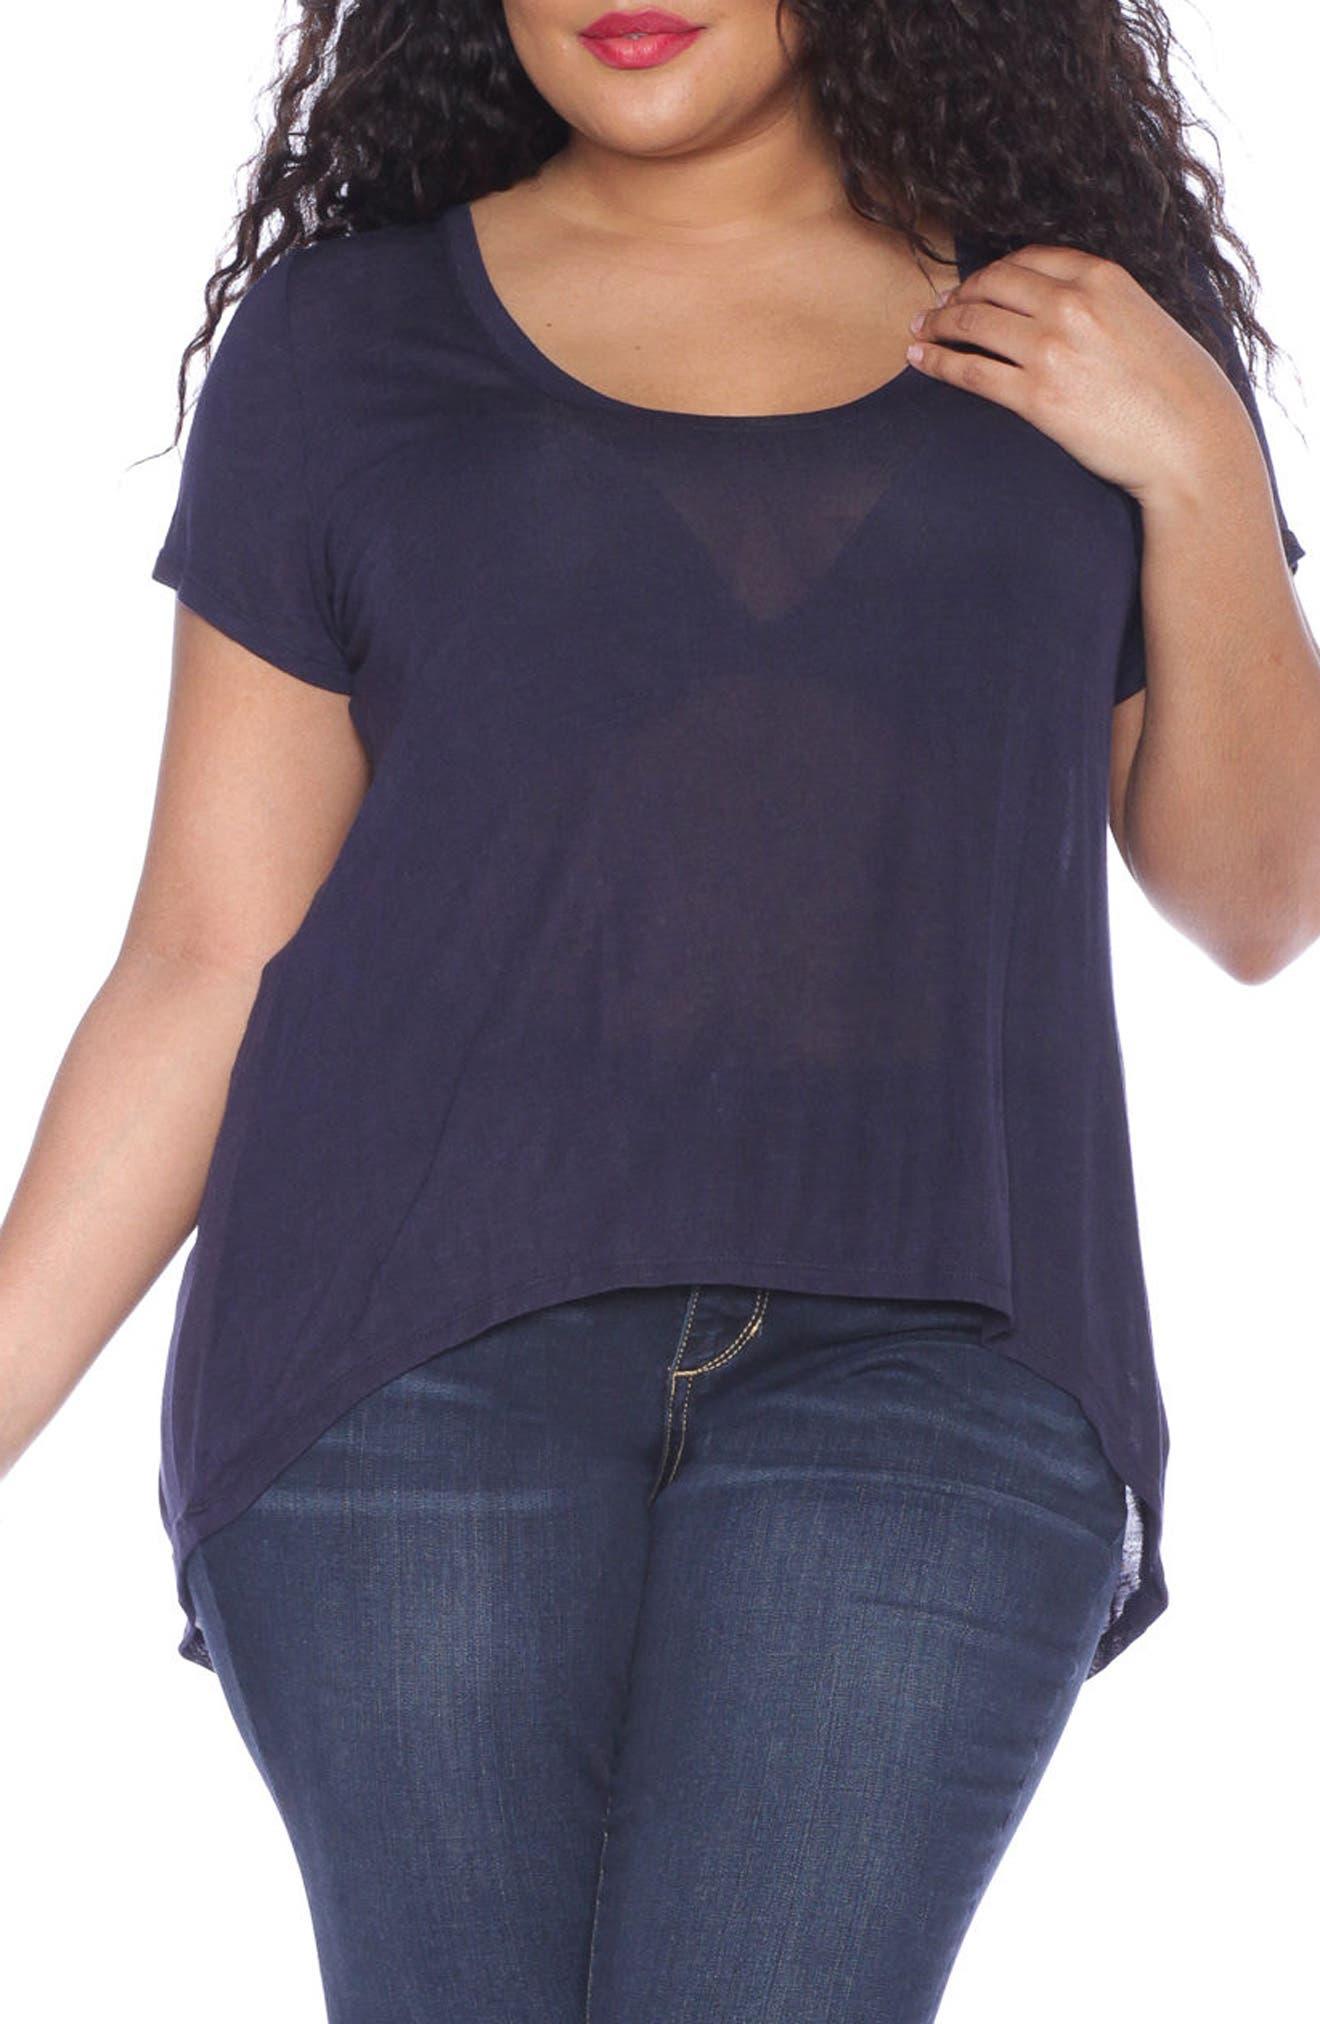 SLINK Jeans High/Low Scoop Neck Tee (Plus Size)